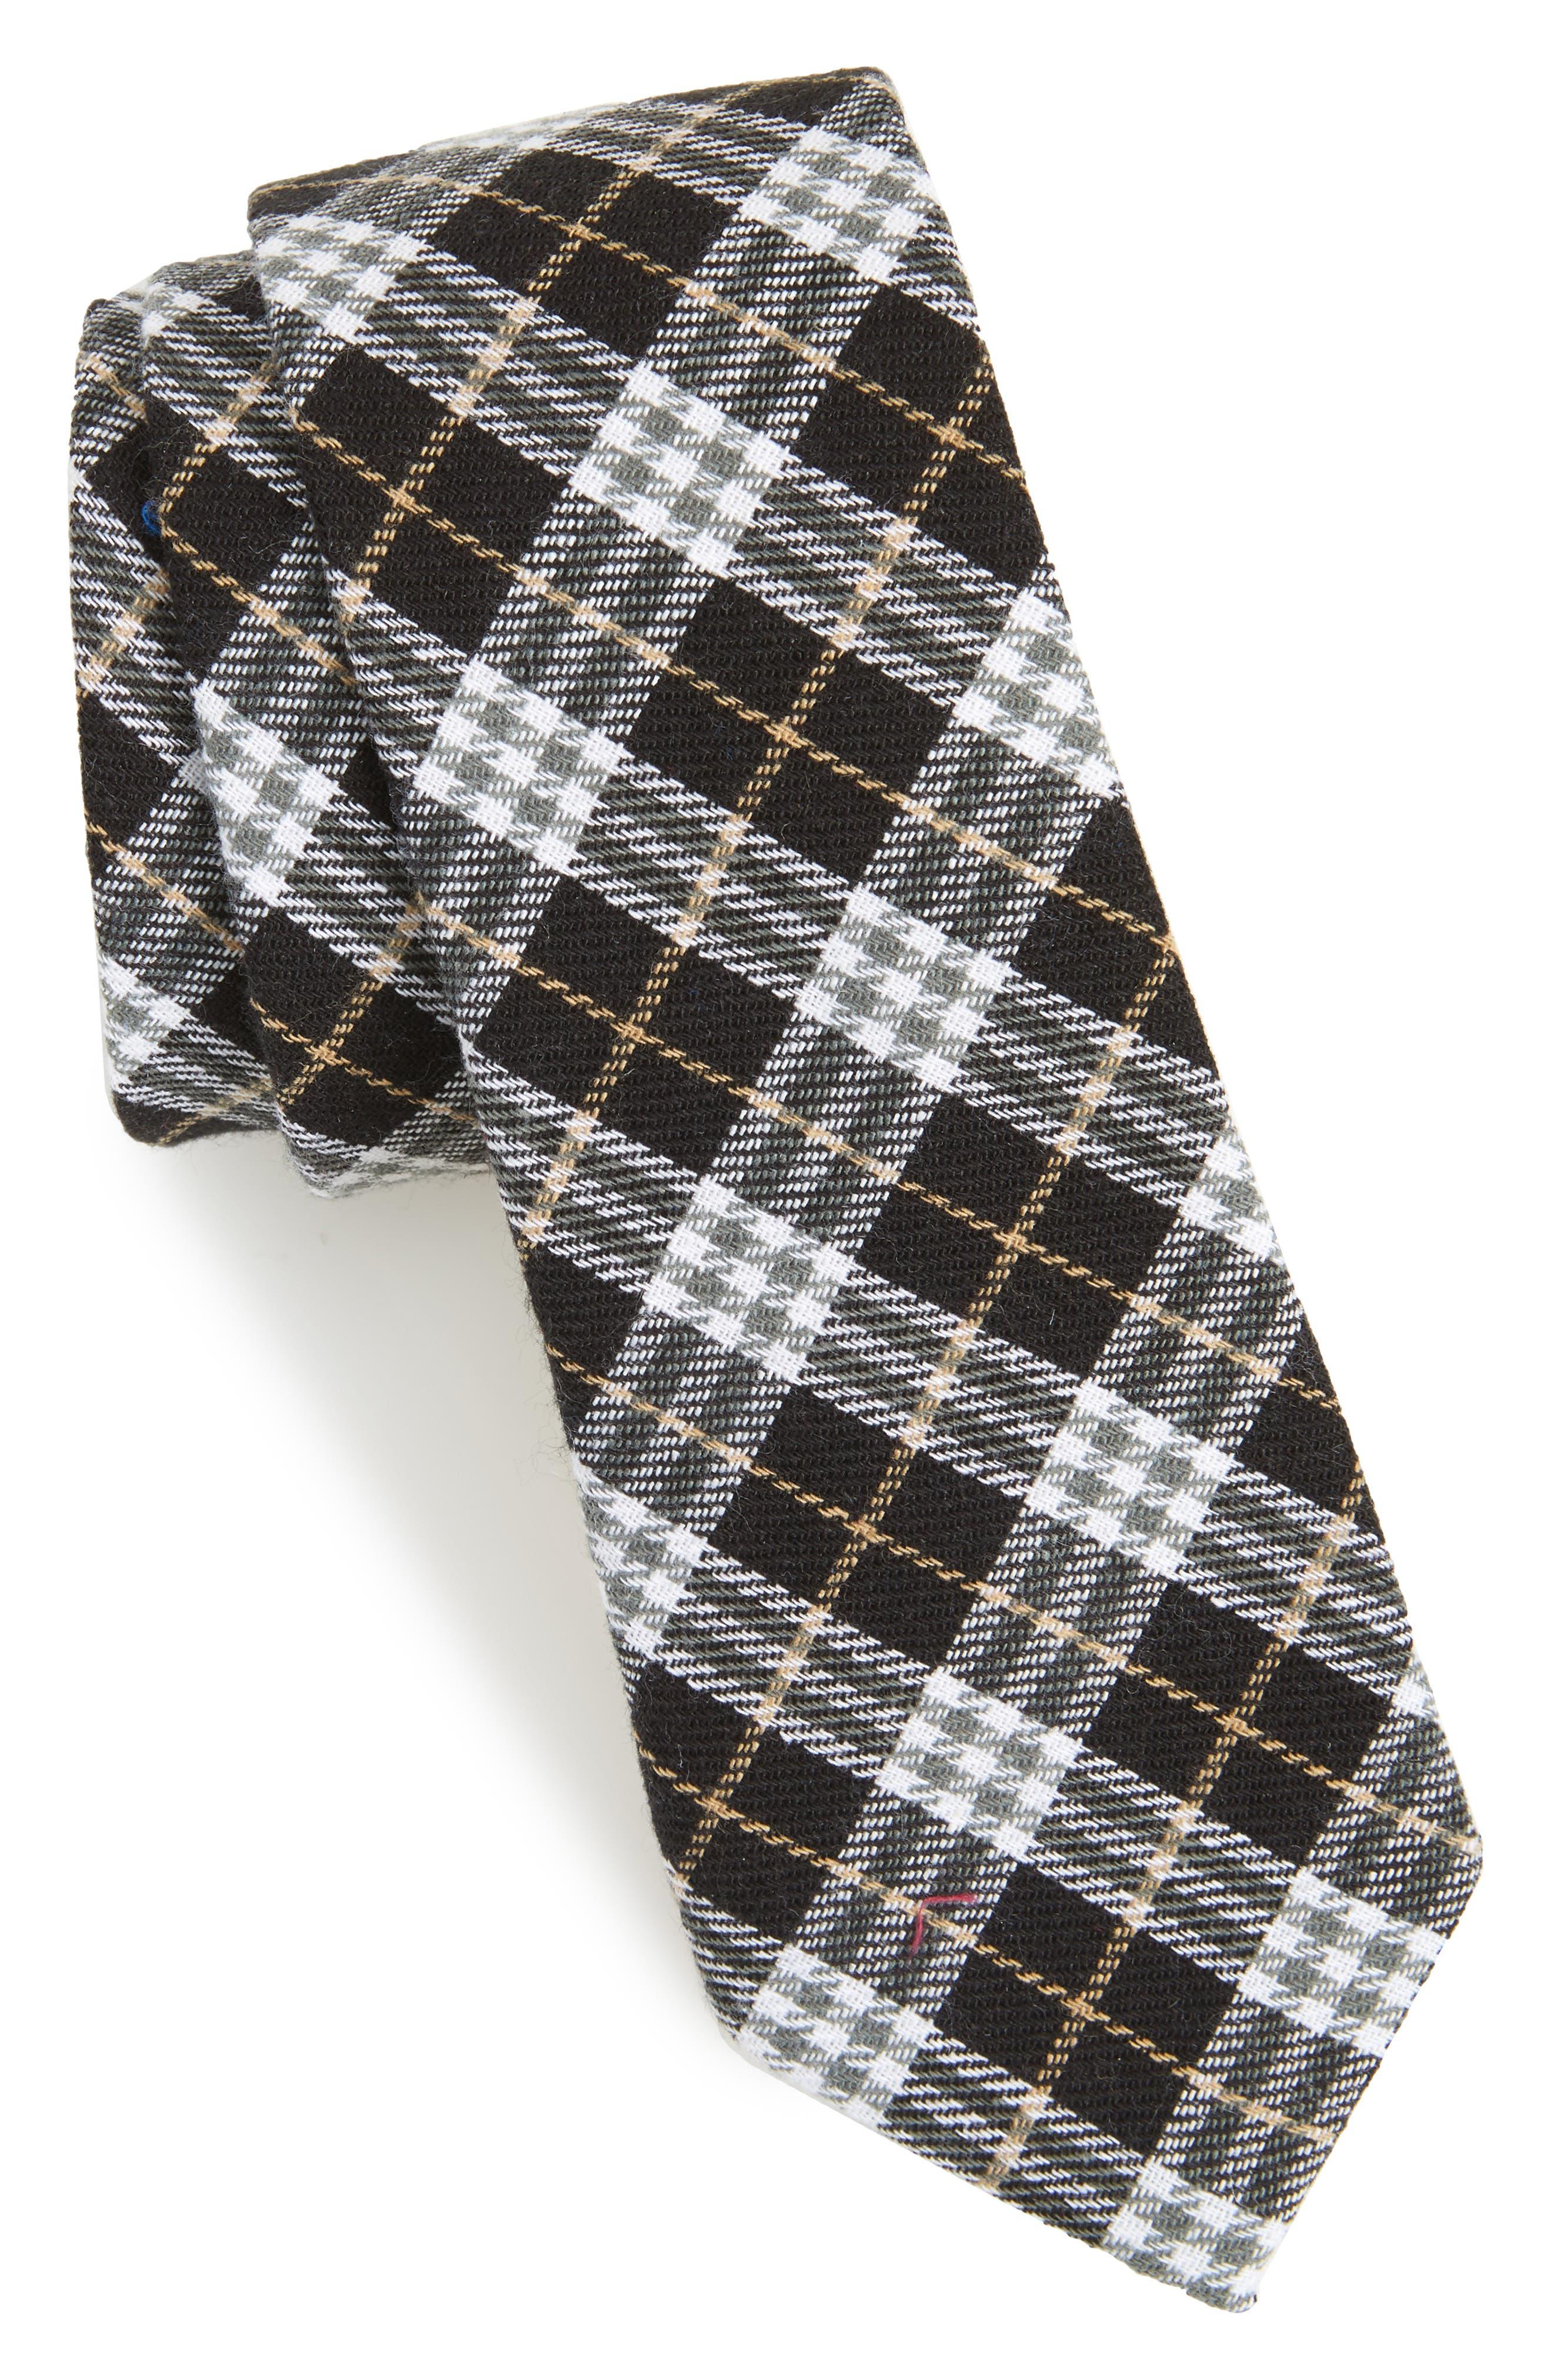 Main Image - 1901 Siegel Plaid Cotton & Linen Skinny Tie